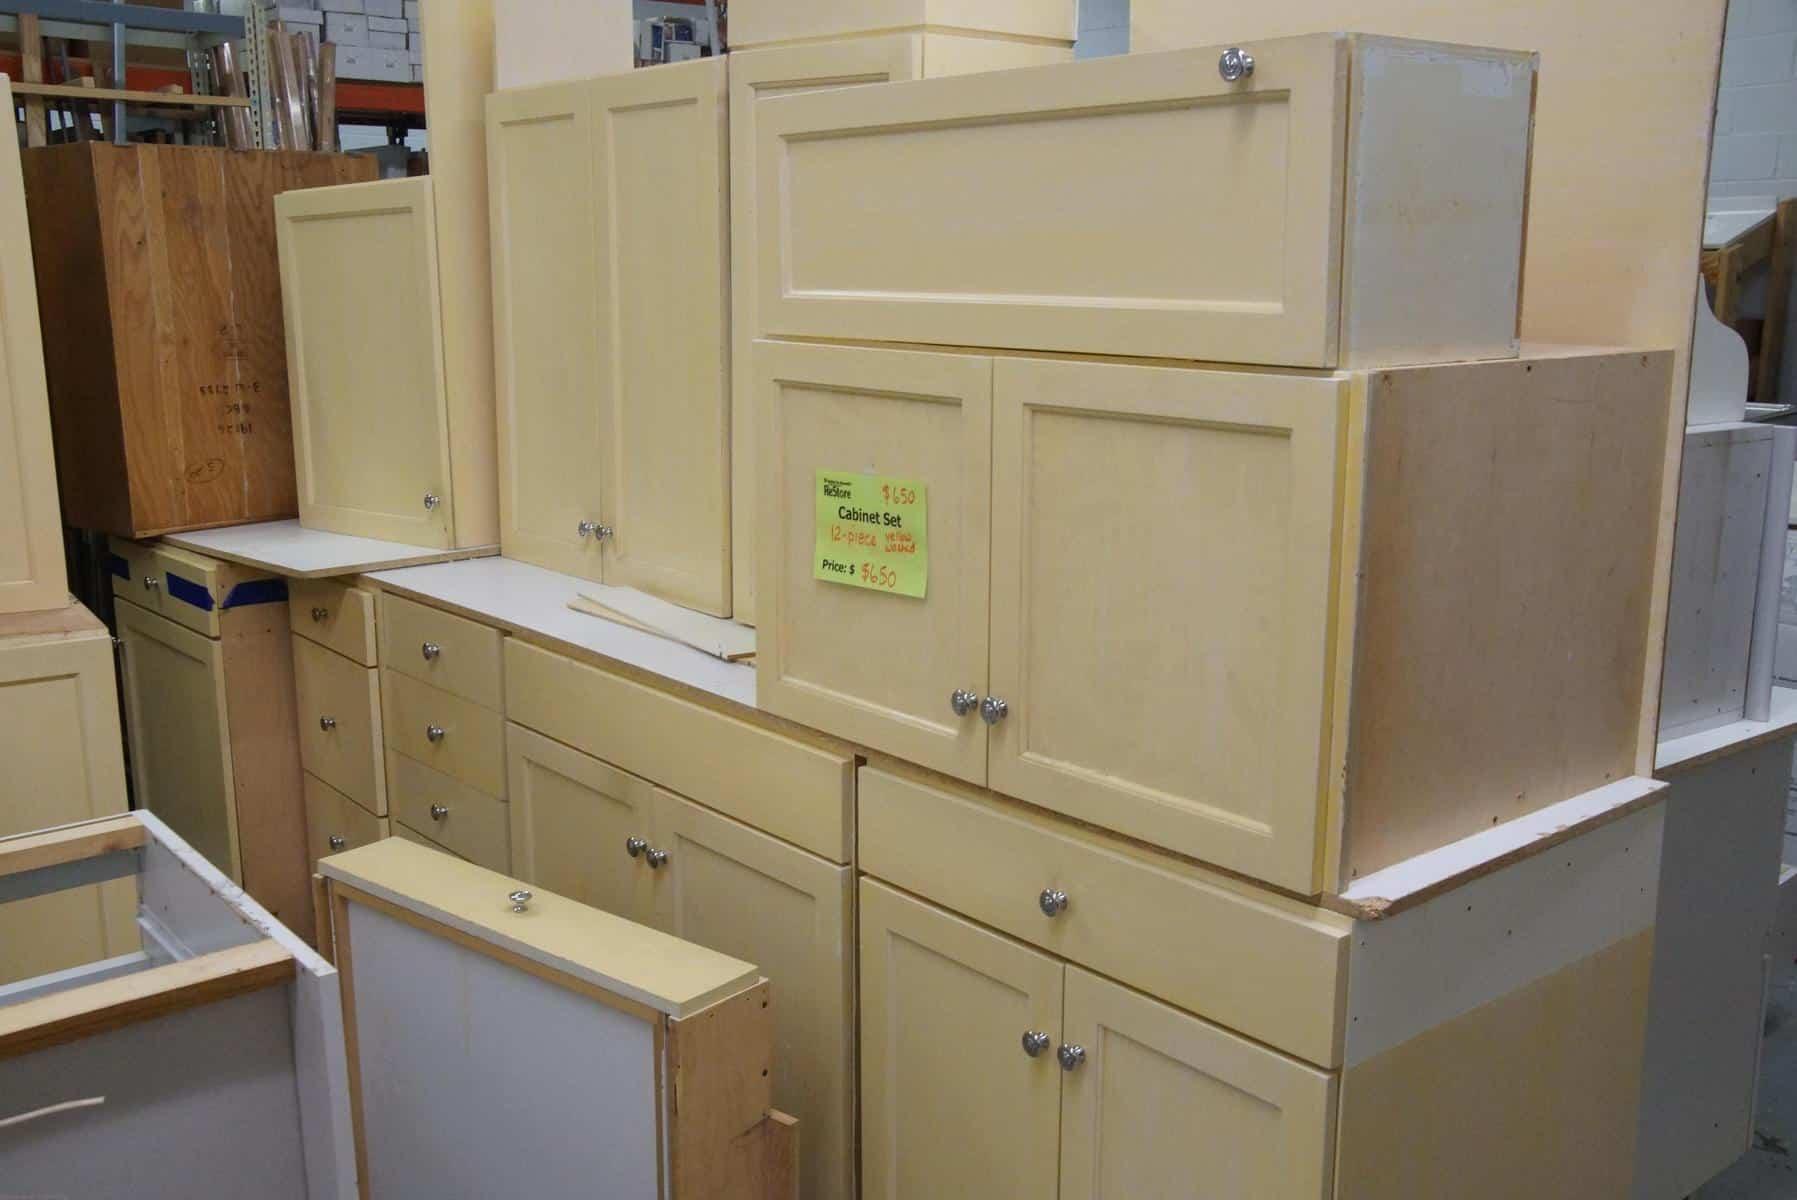 habitat for humanity restore kitchen cabinets habitat for humanity kitchen cabinets habitat. Black Bedroom Furniture Sets. Home Design Ideas